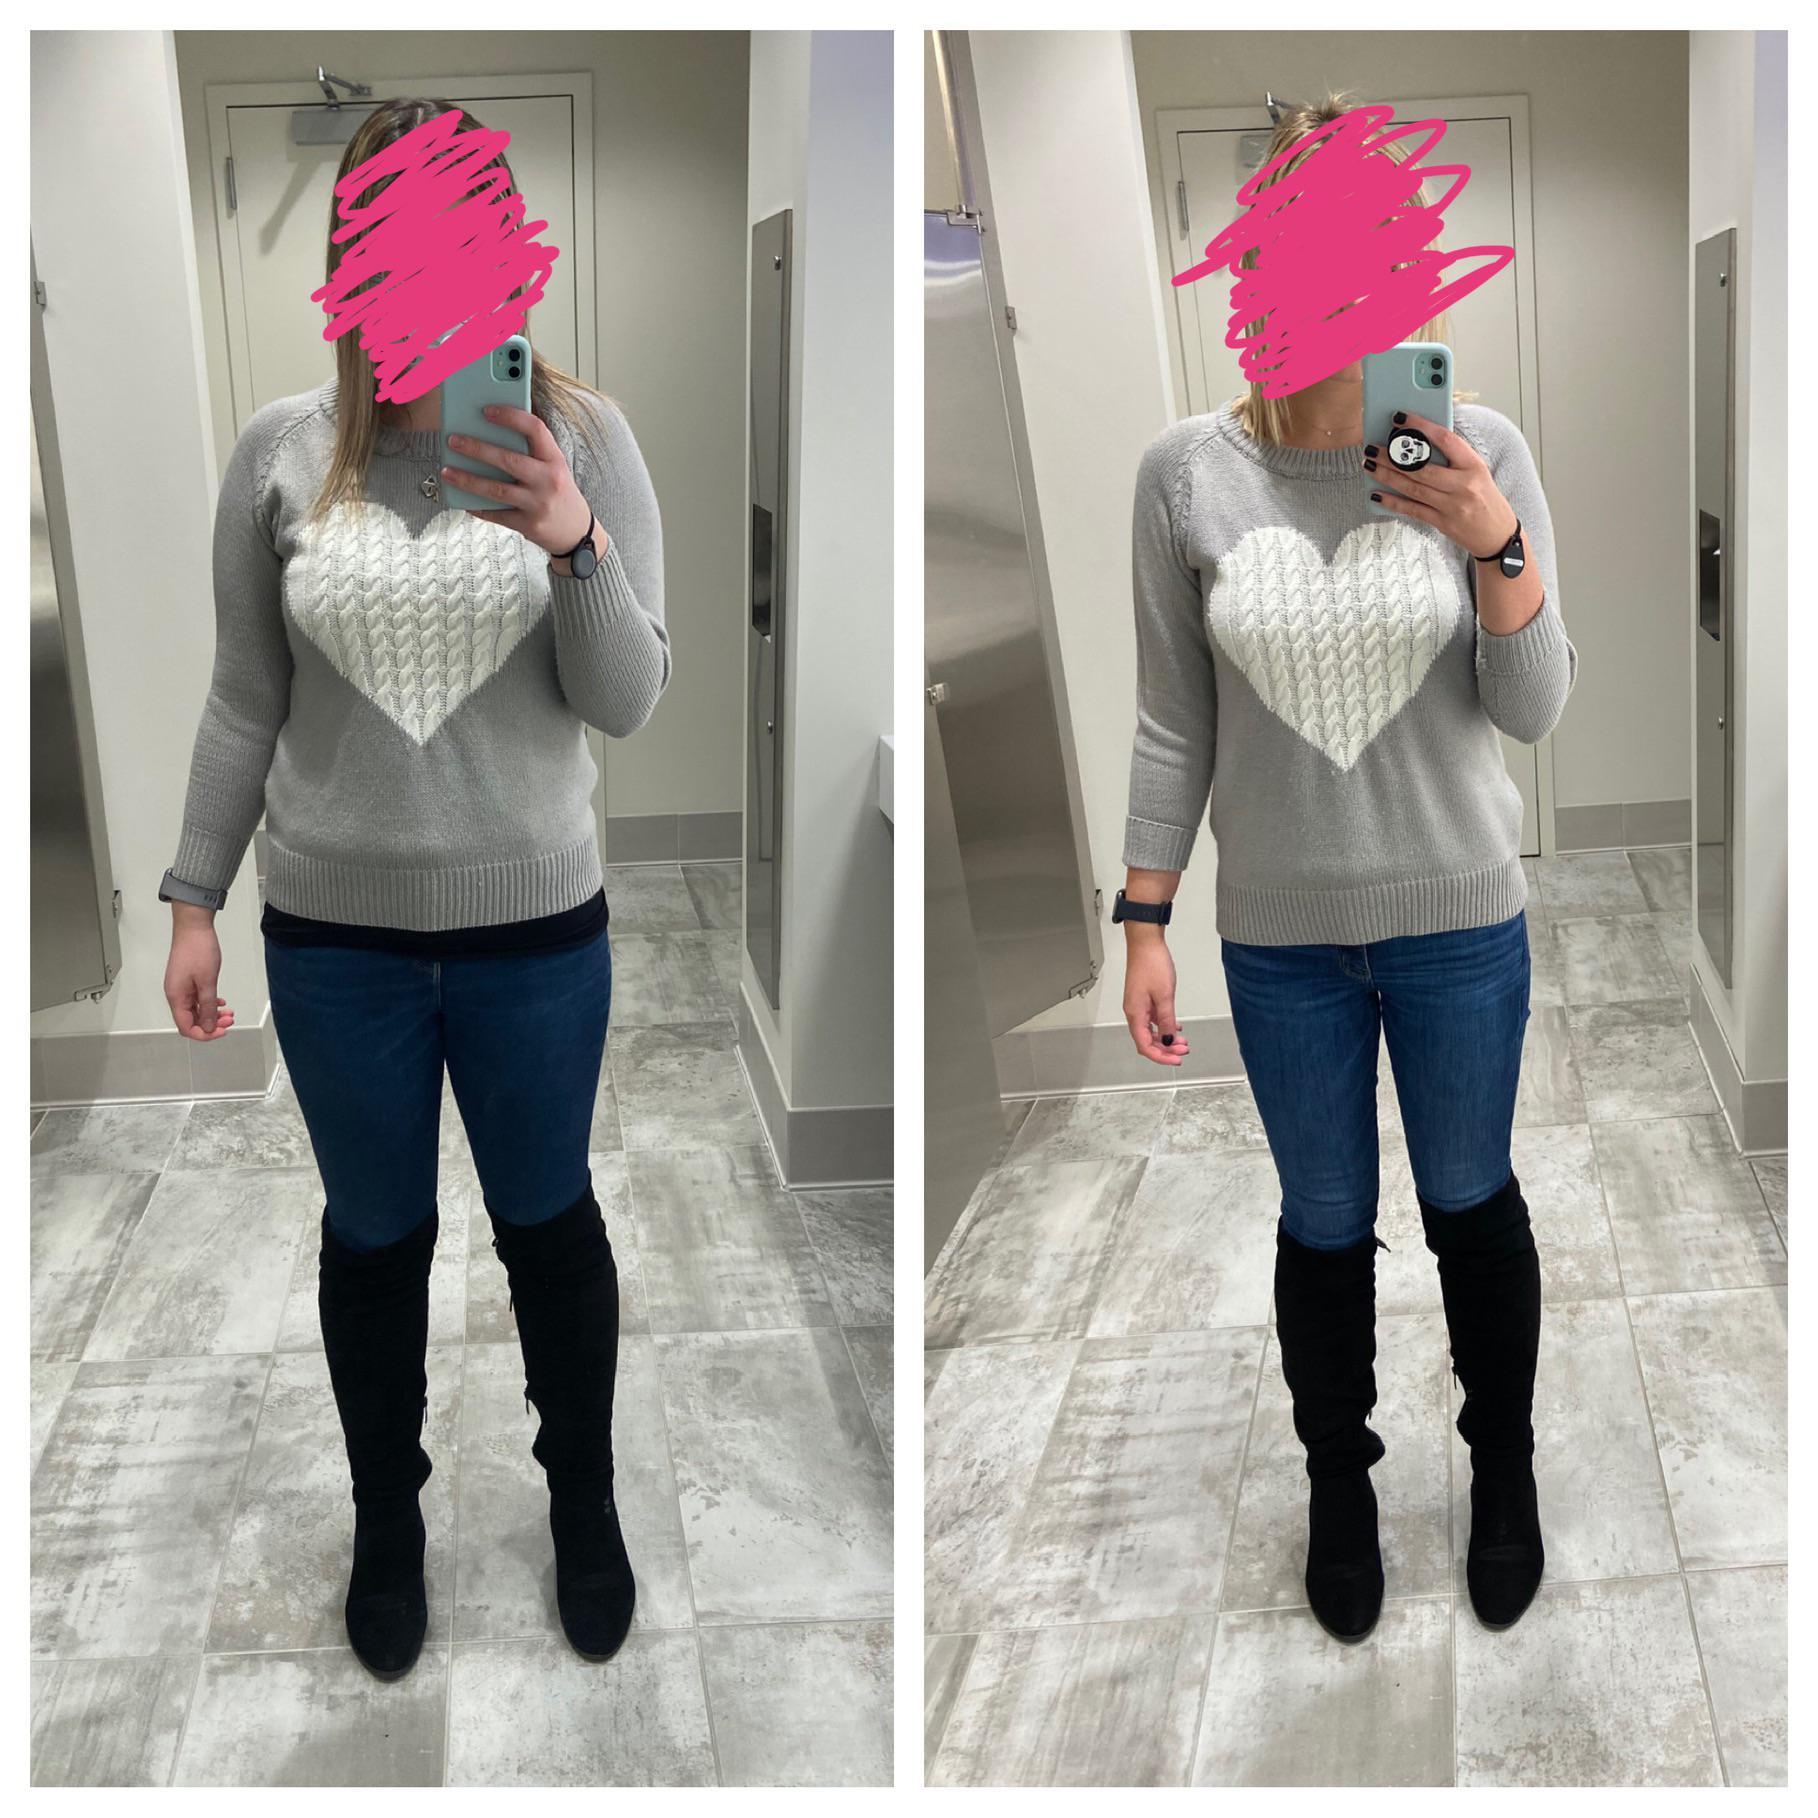 21 lbs Fat Loss 5 foot 7 Female 168 lbs to 147 lbs